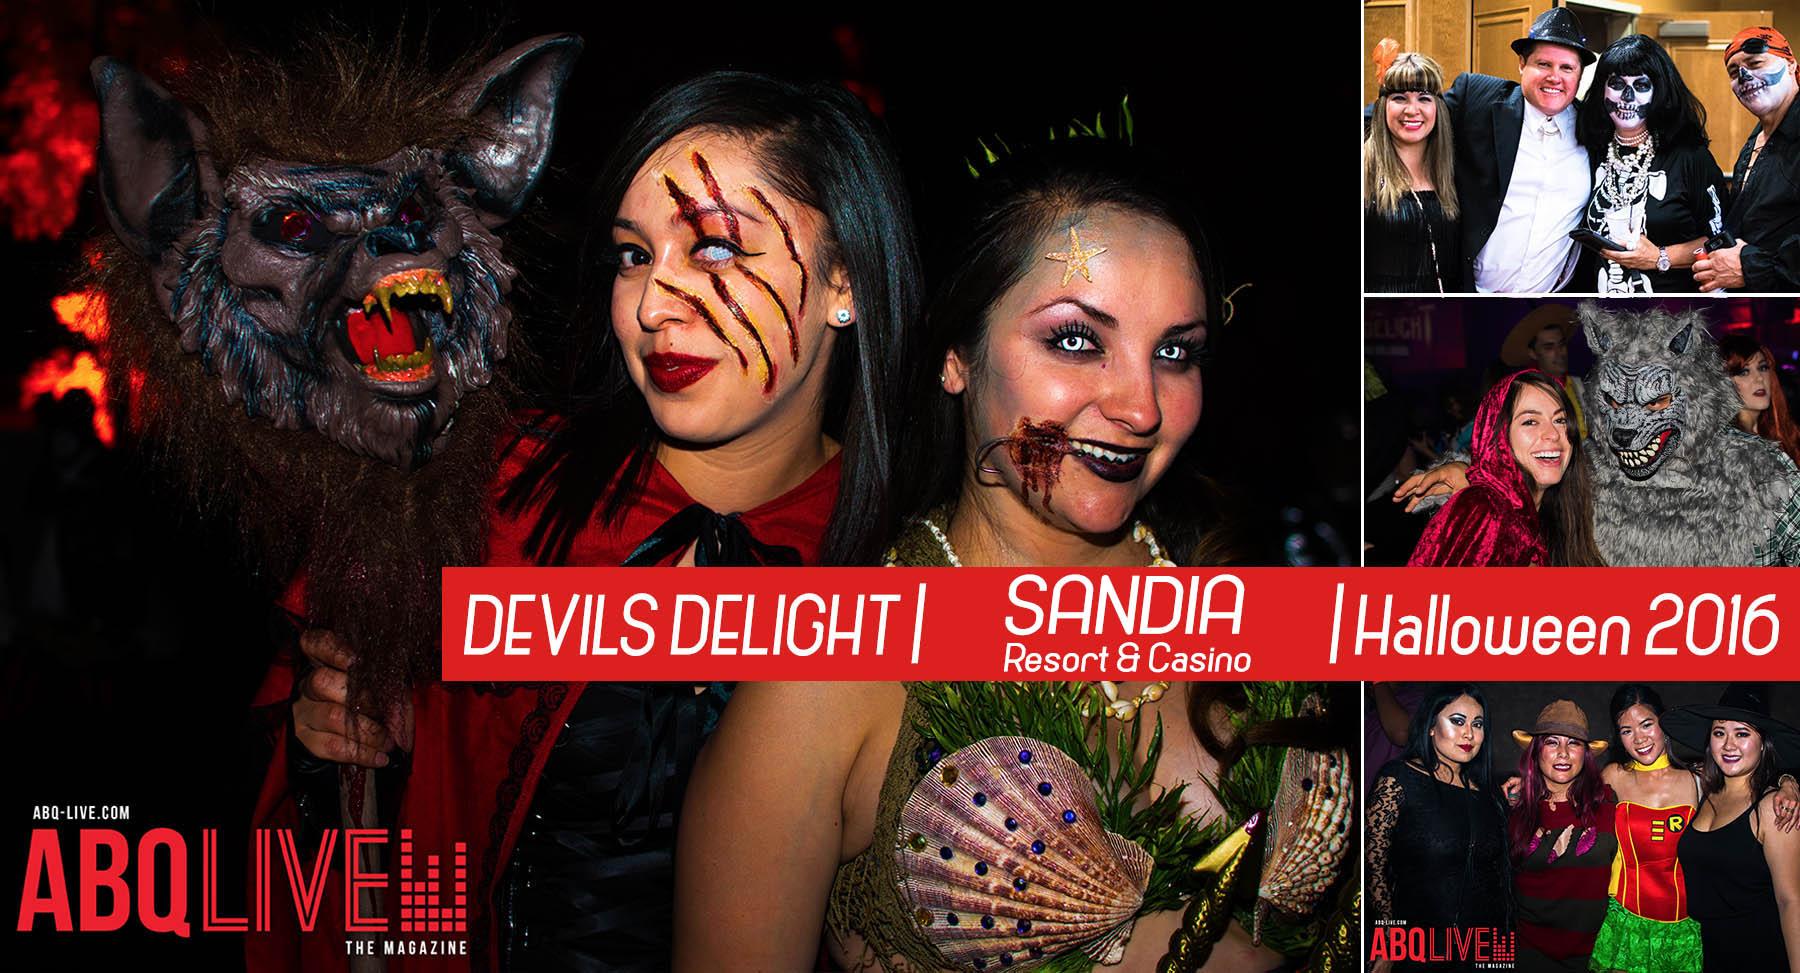 Sandia Halloween Party 2020 Pics Devil's Delight | Sandia Resort & Casino's 2016 Halloween Party